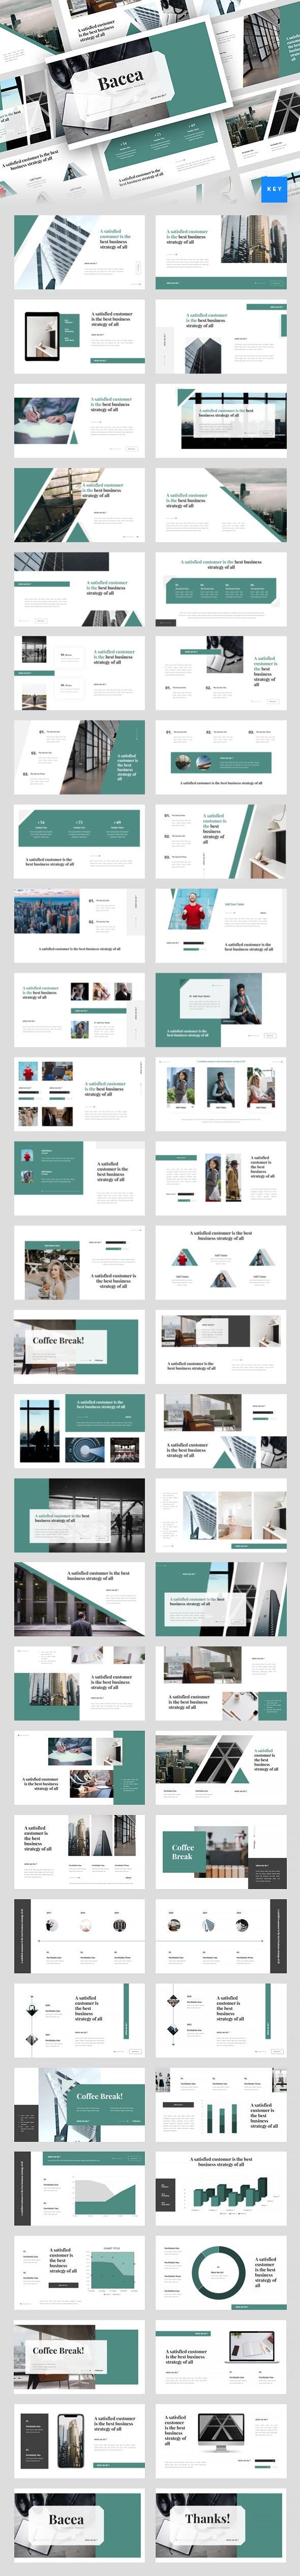 Bacea - Business Keynote Template - Business Keynote Templates